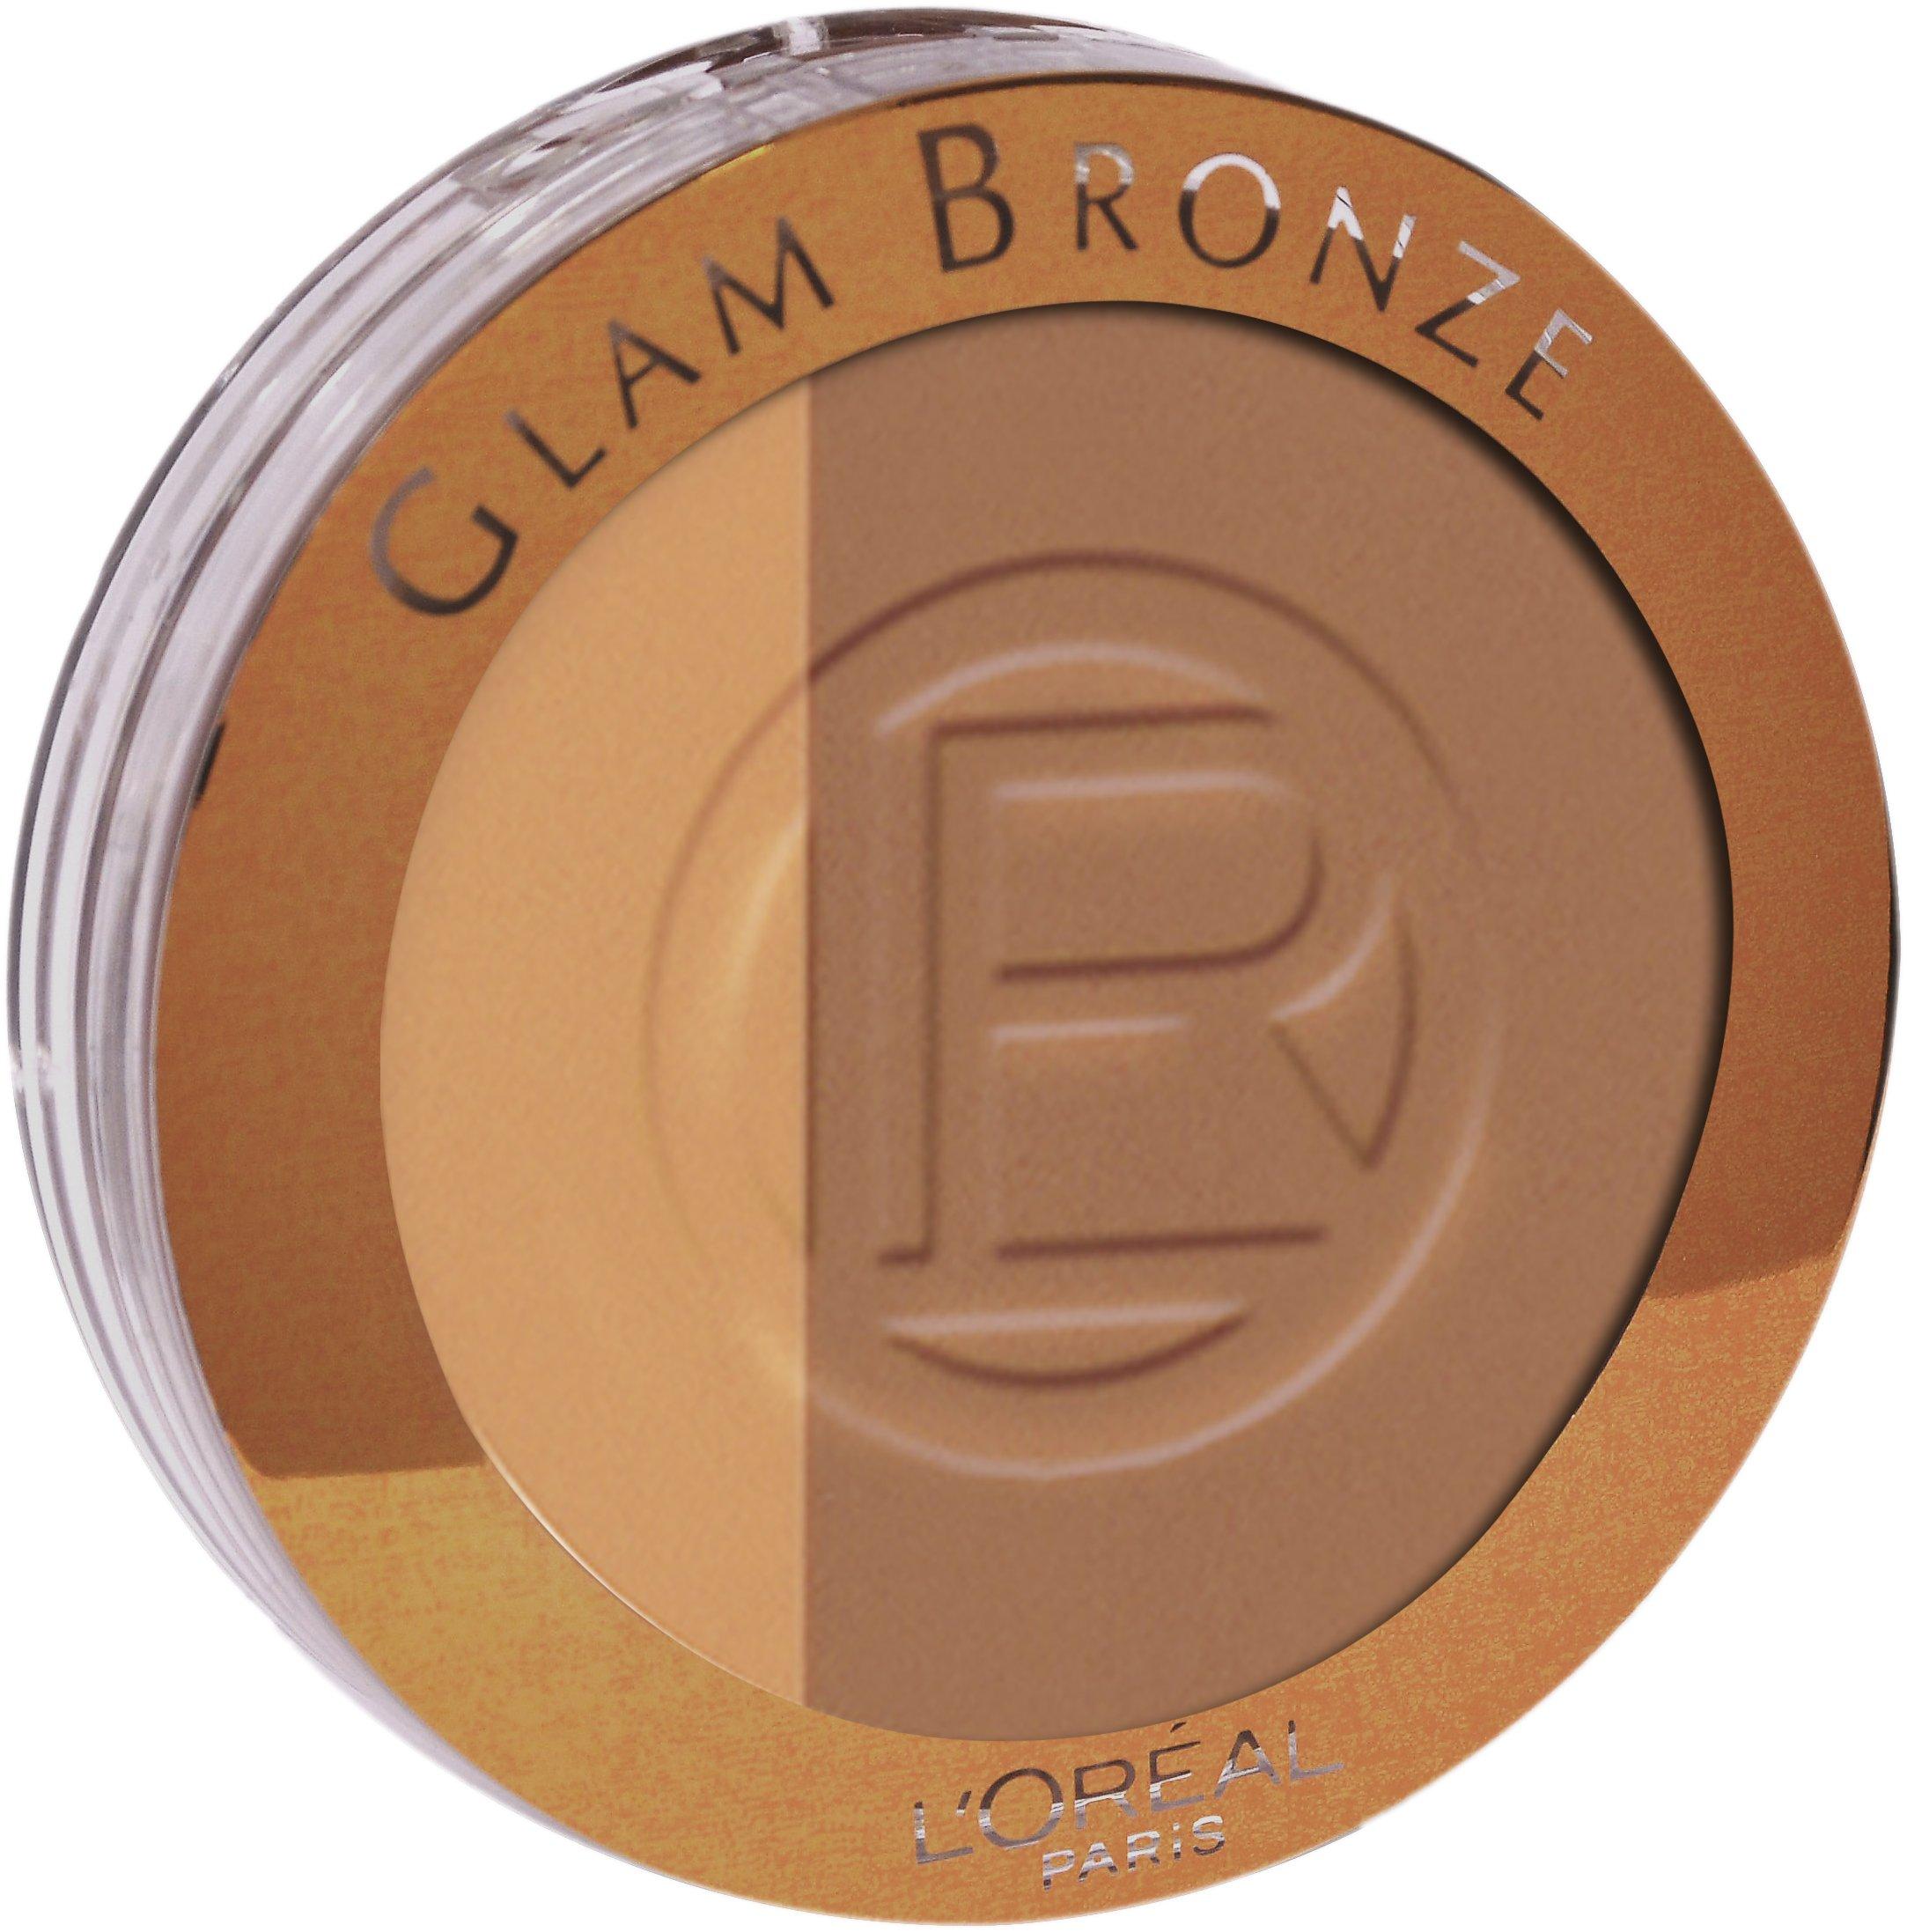 Glam Bronze Duo Powder 102 Harmonie Brunes